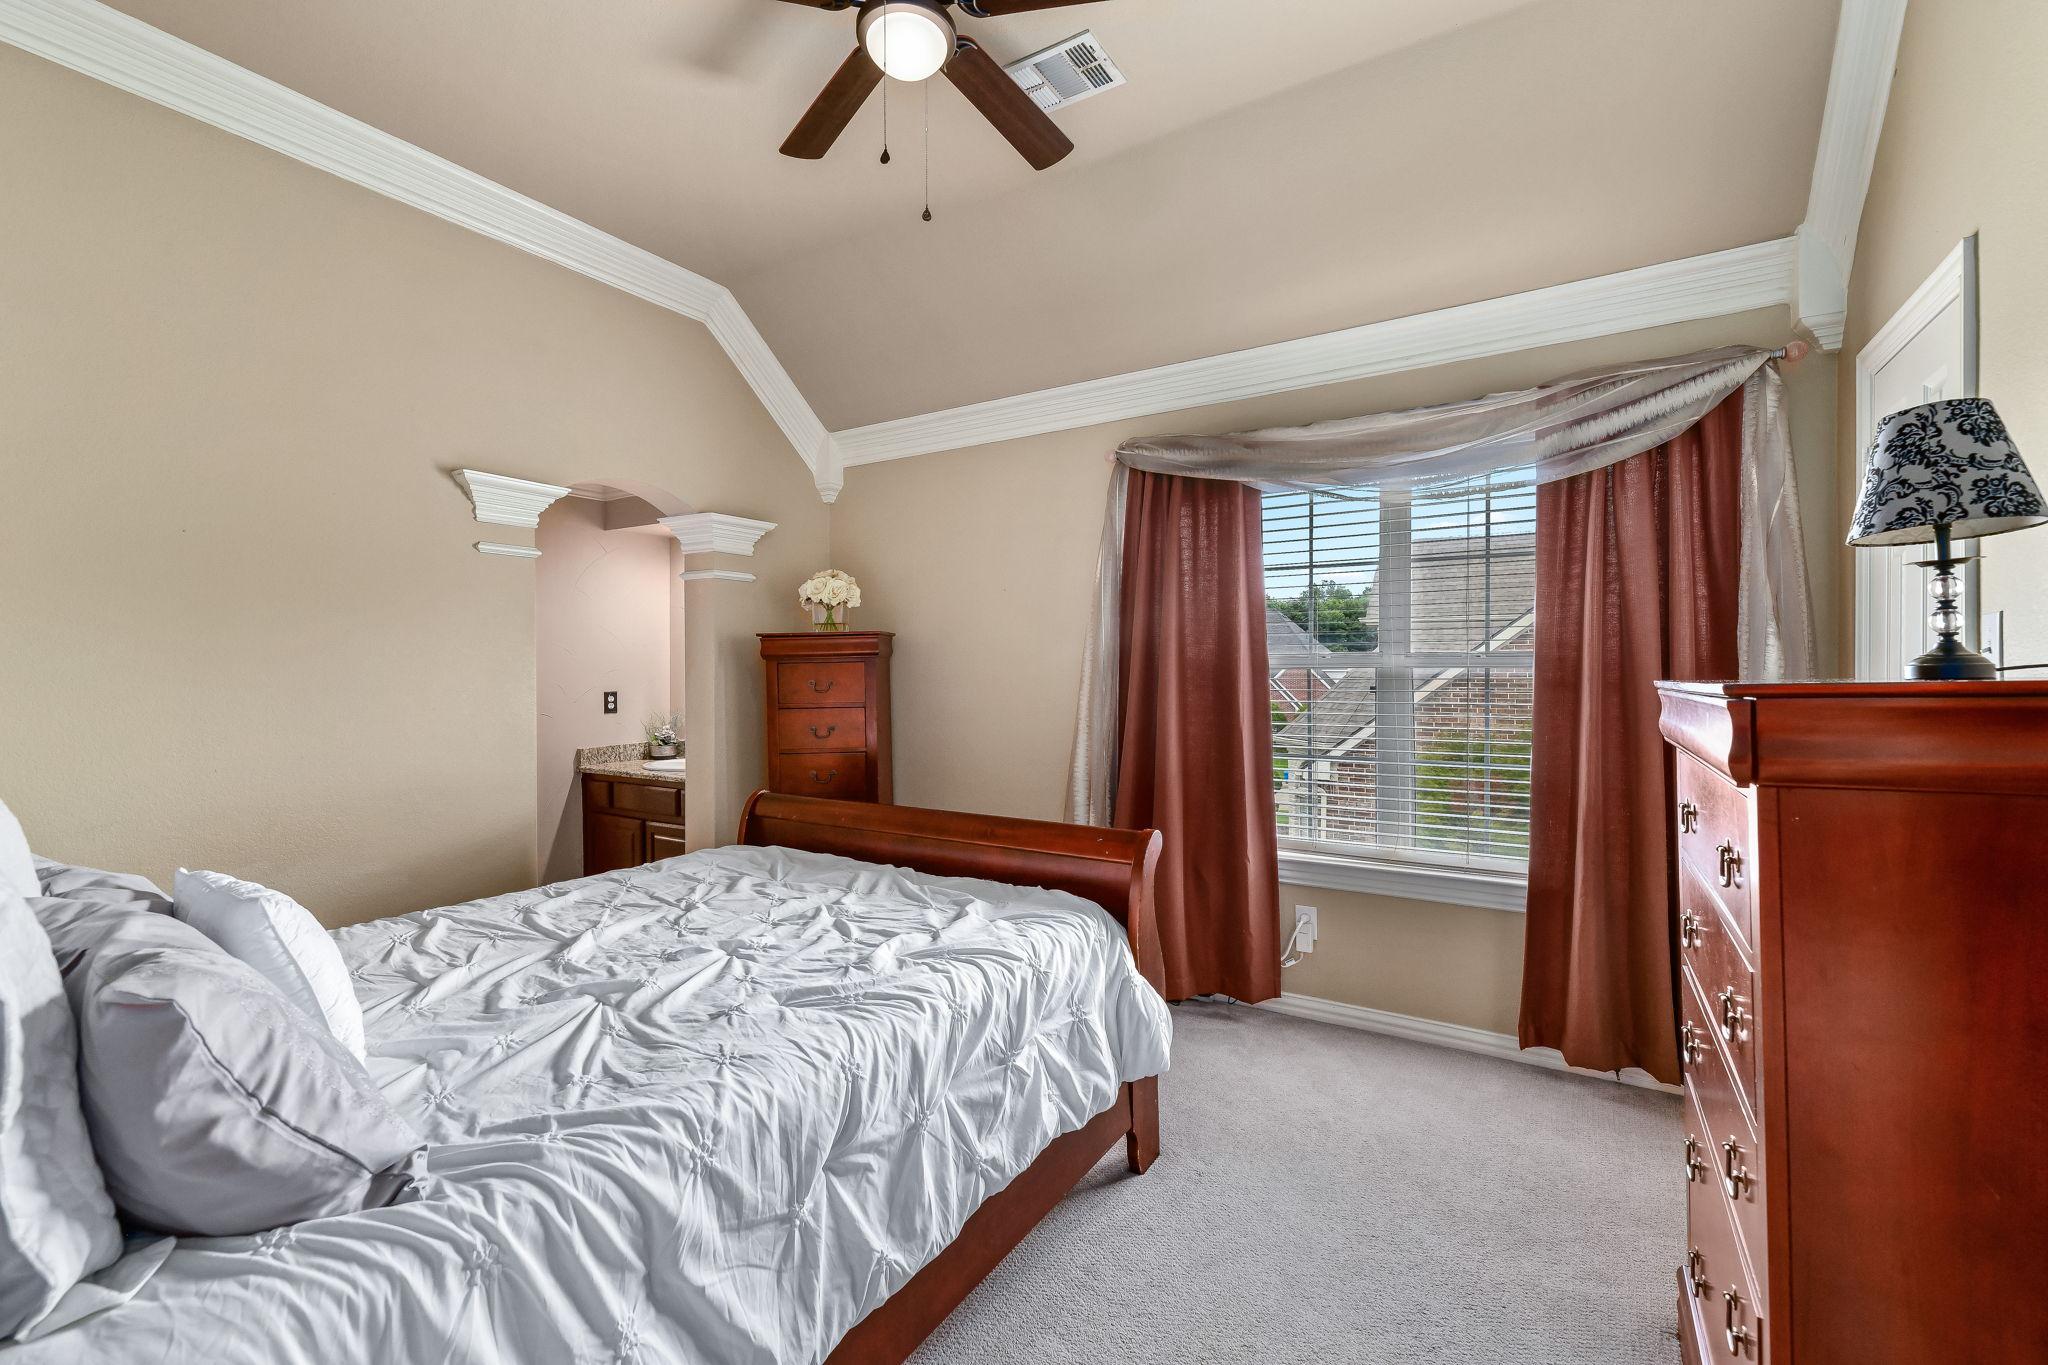 038-Bedroom 3-FULL